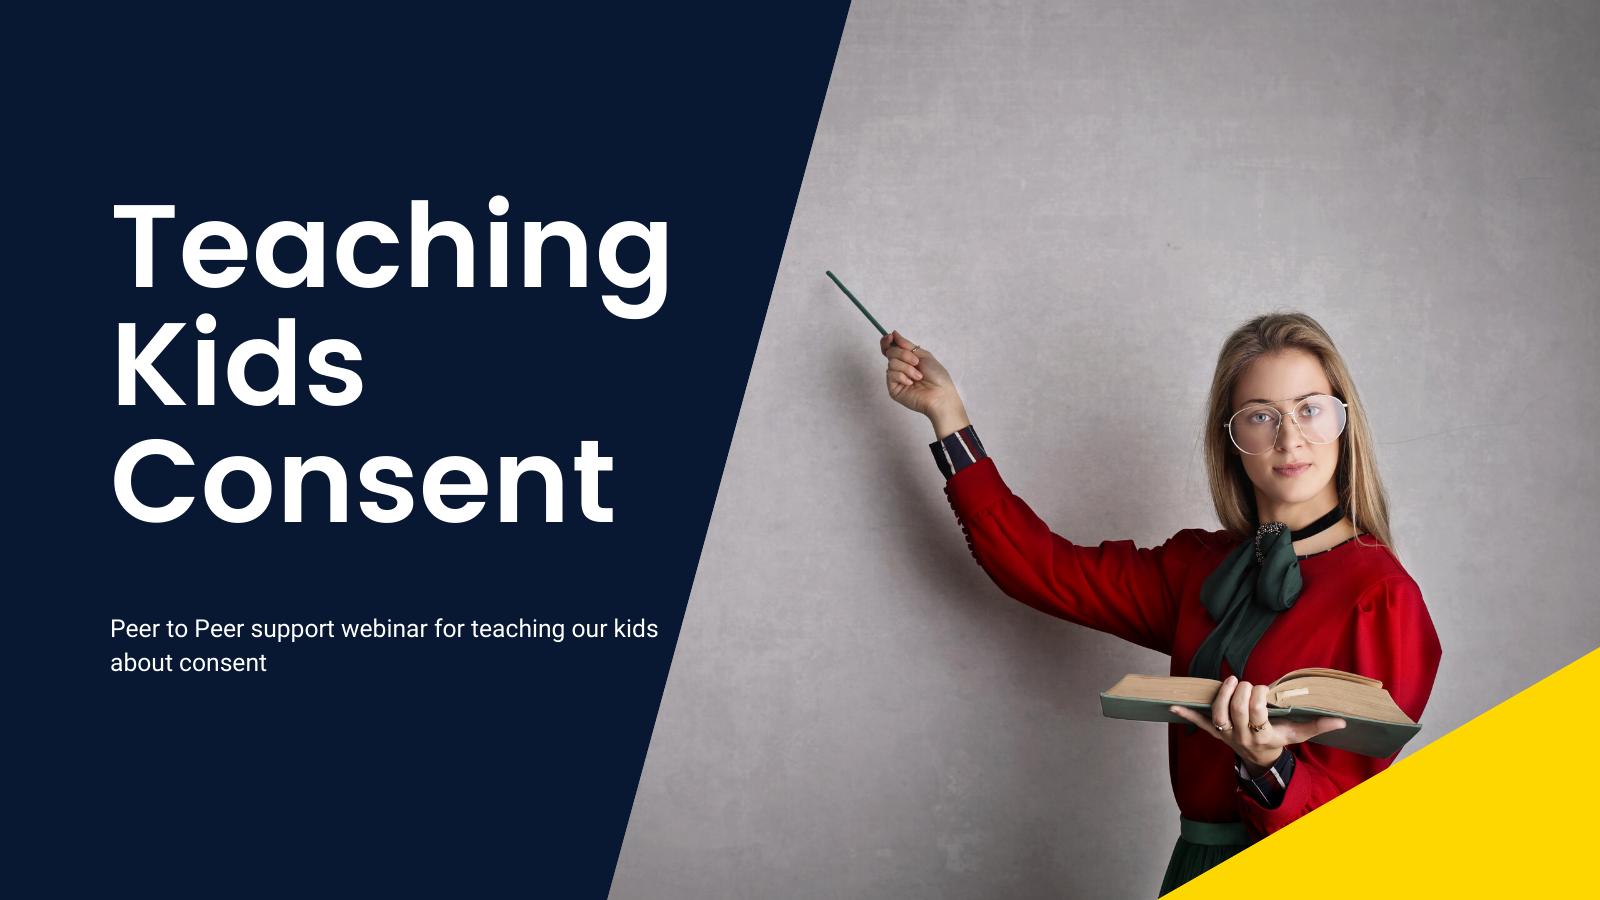 Teaching Kids Consent